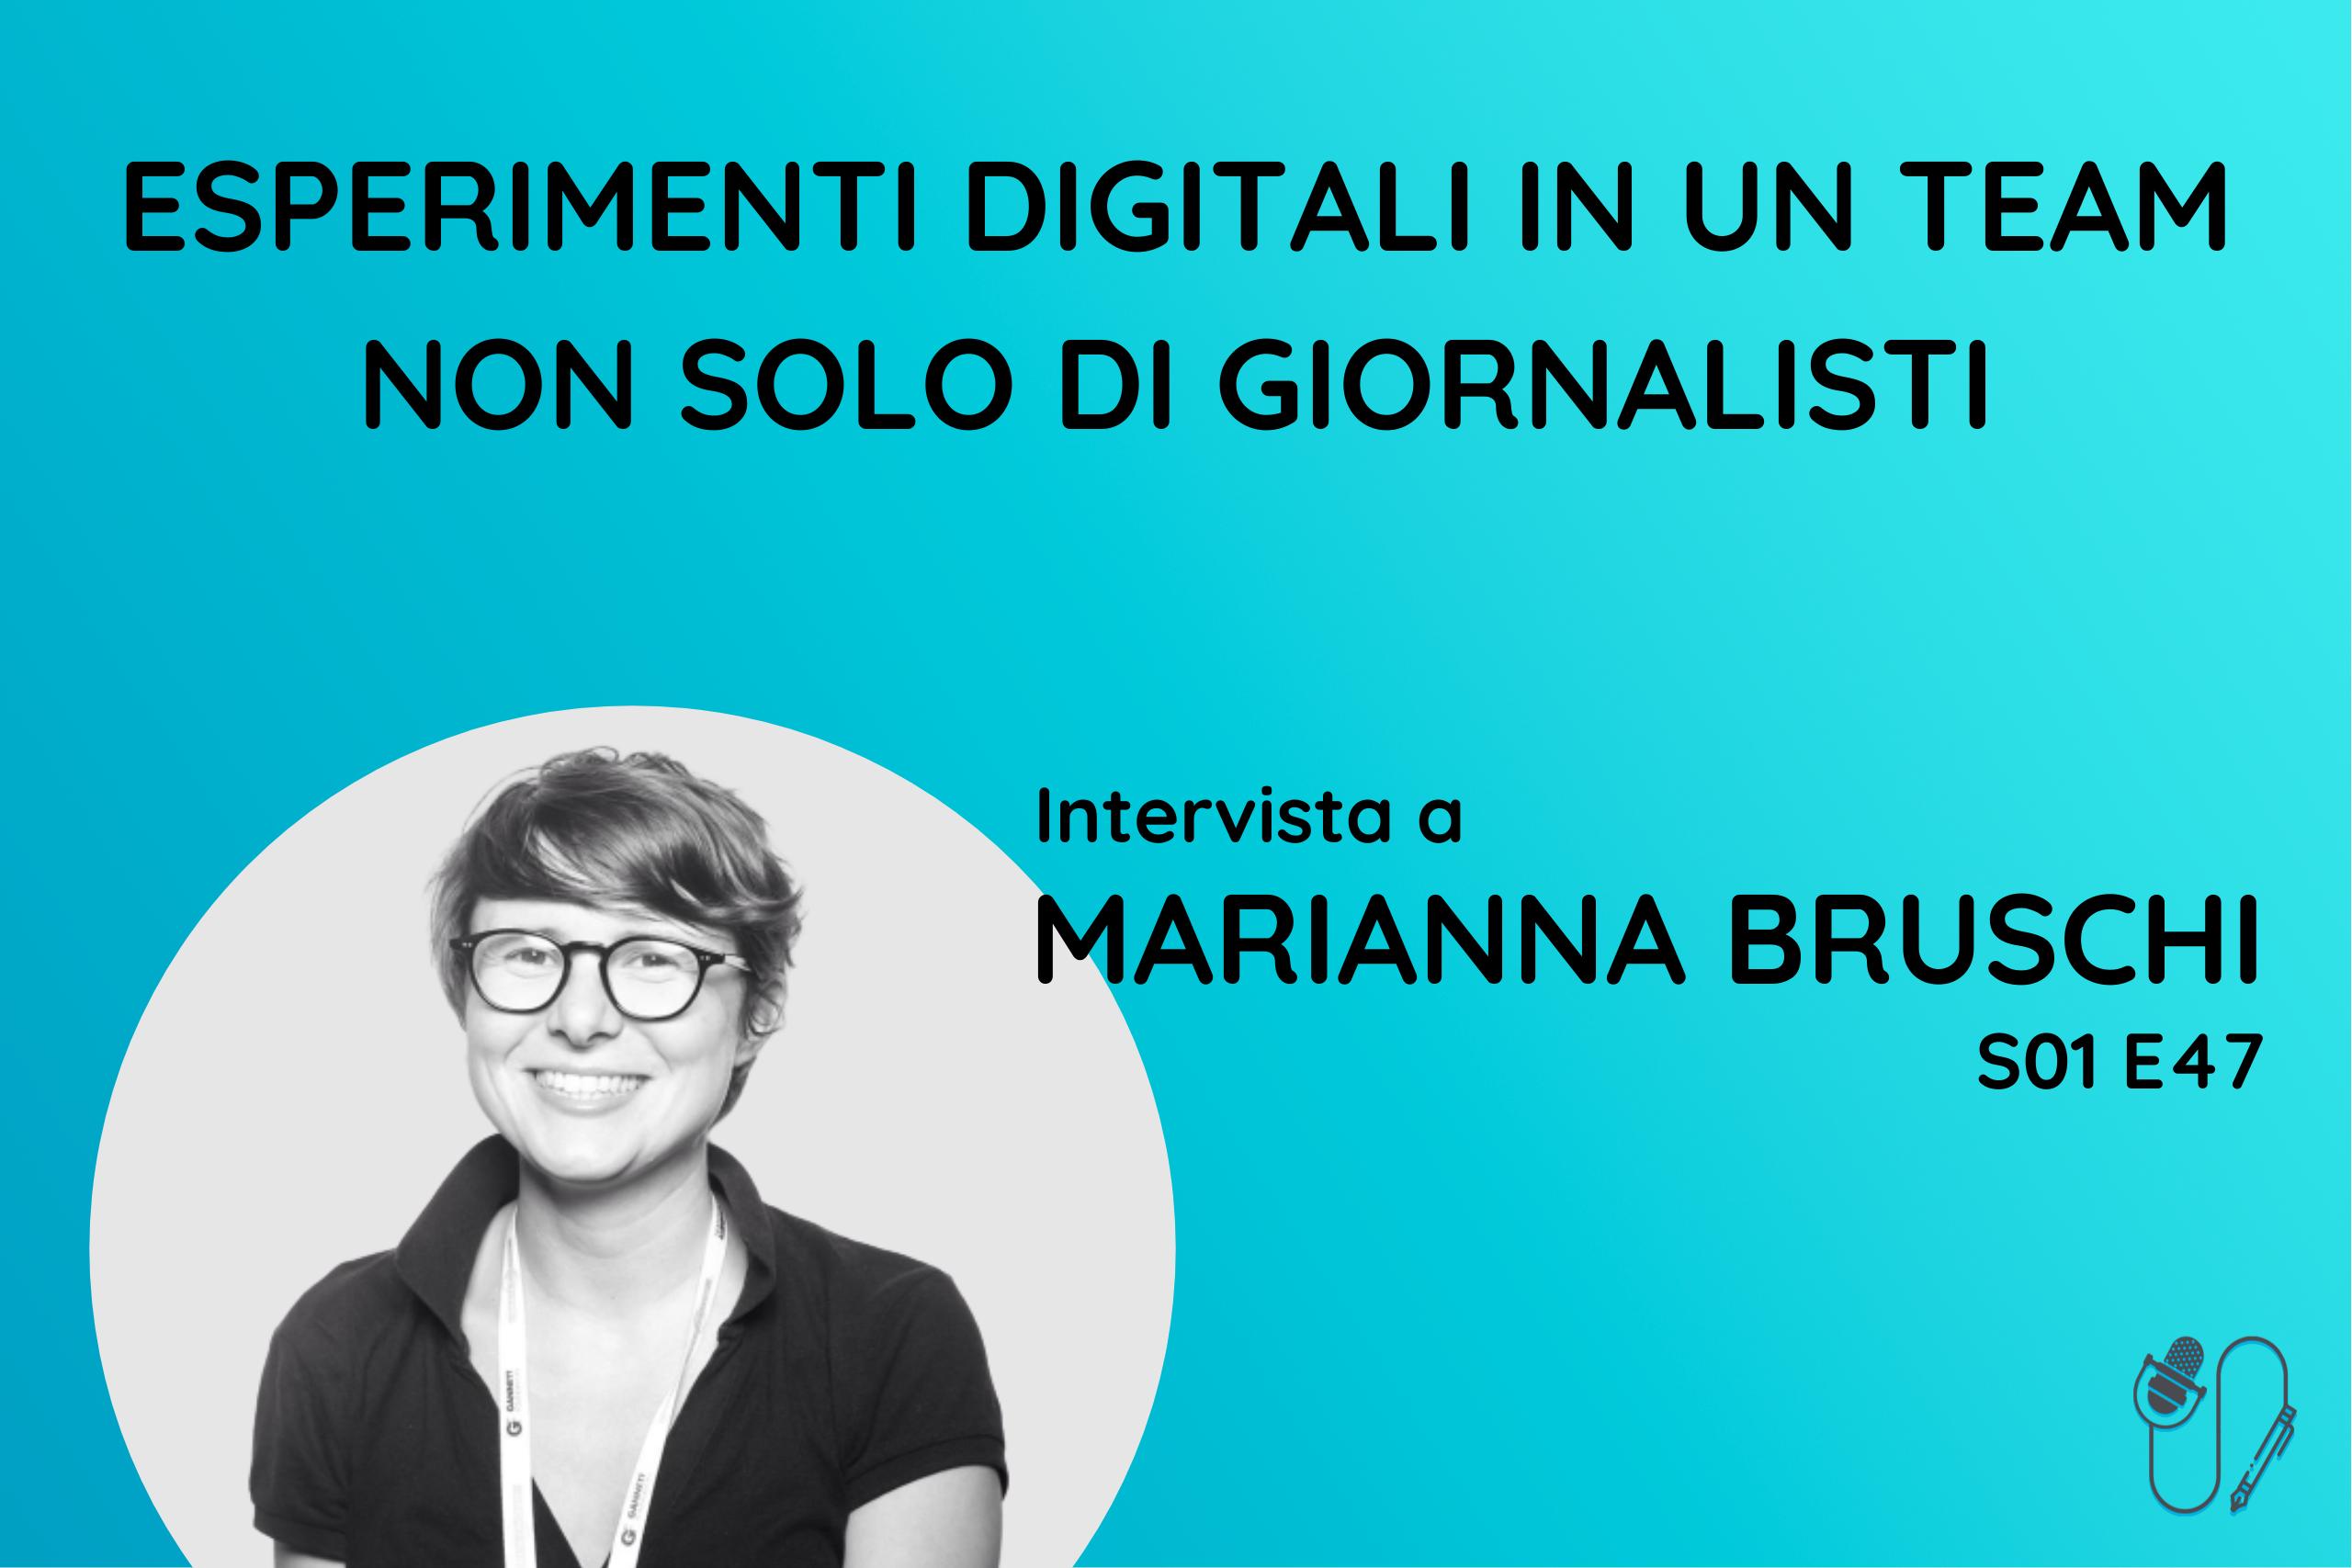 Marianna Bruschi